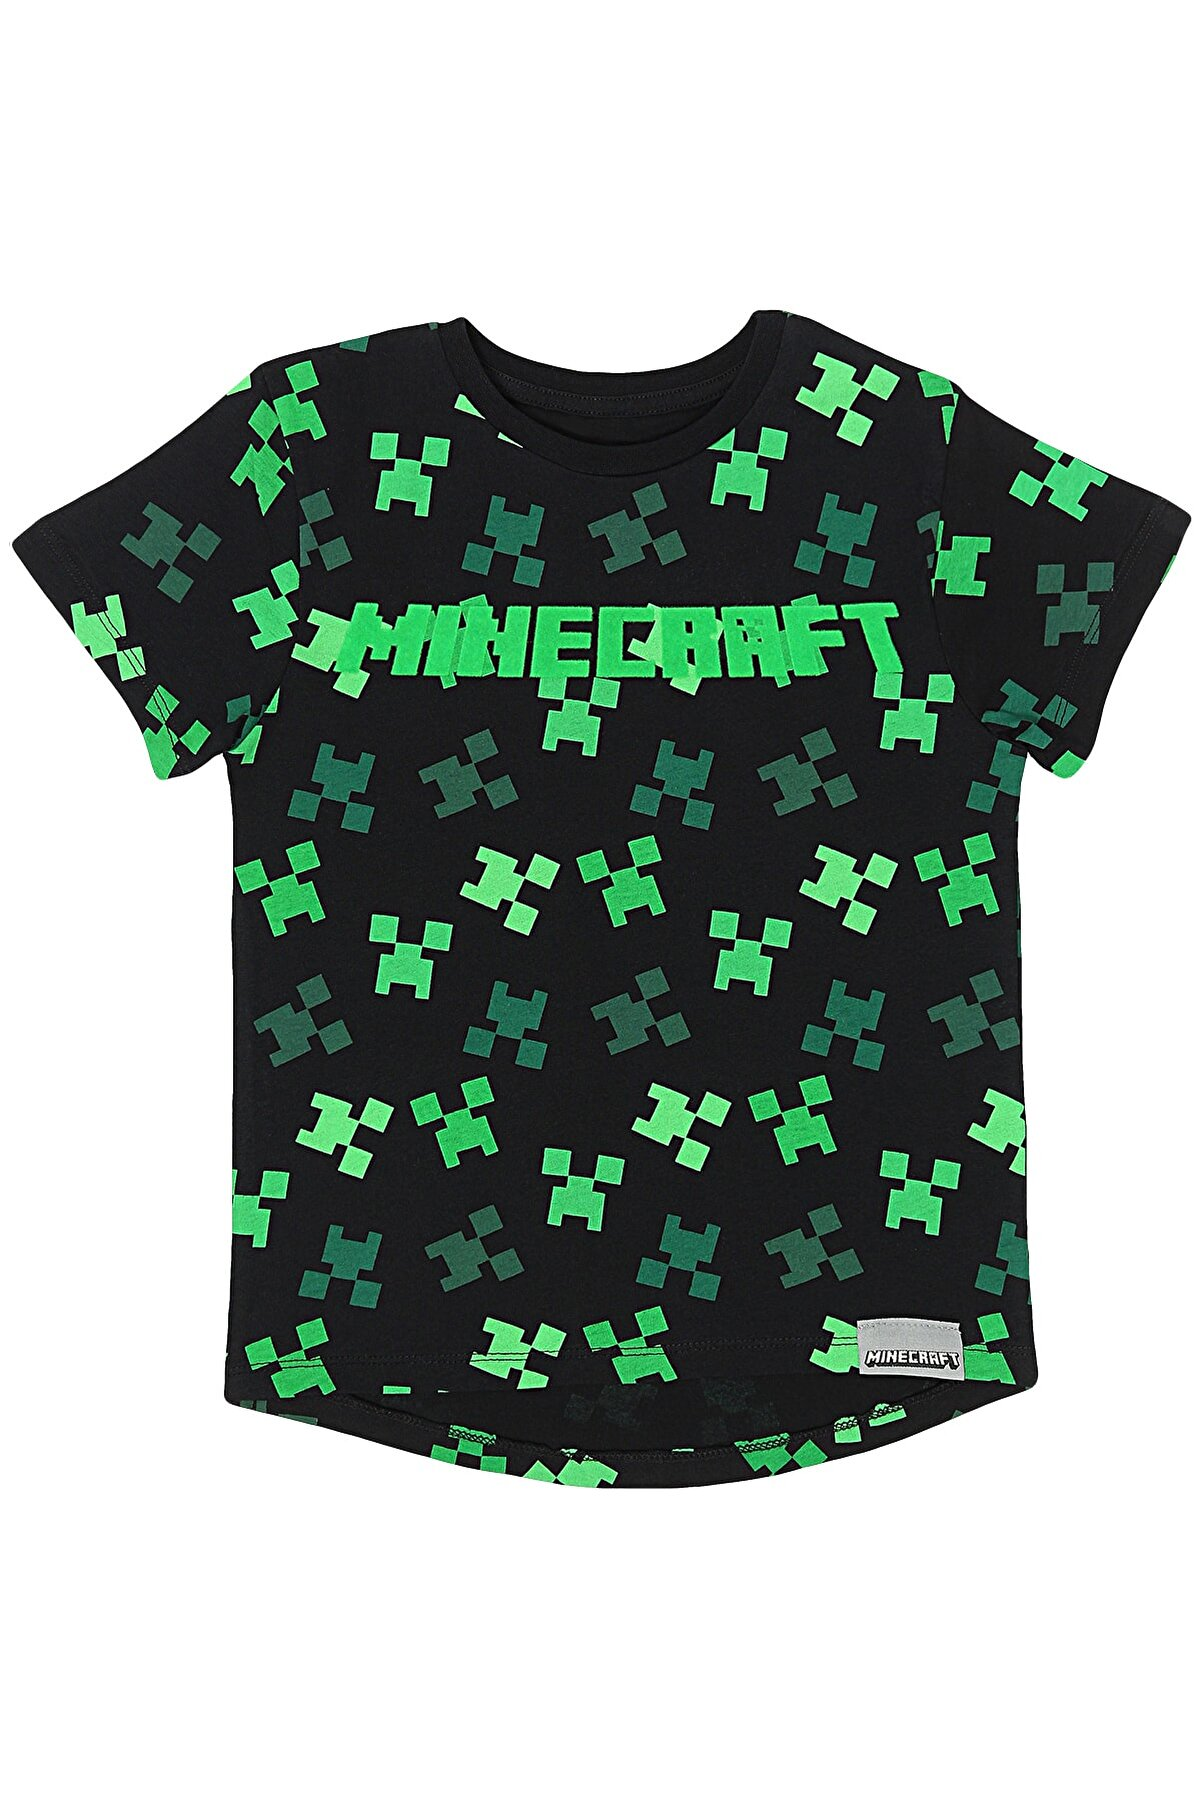 Minecraft Erkek Çocuk Siyah Tshirt